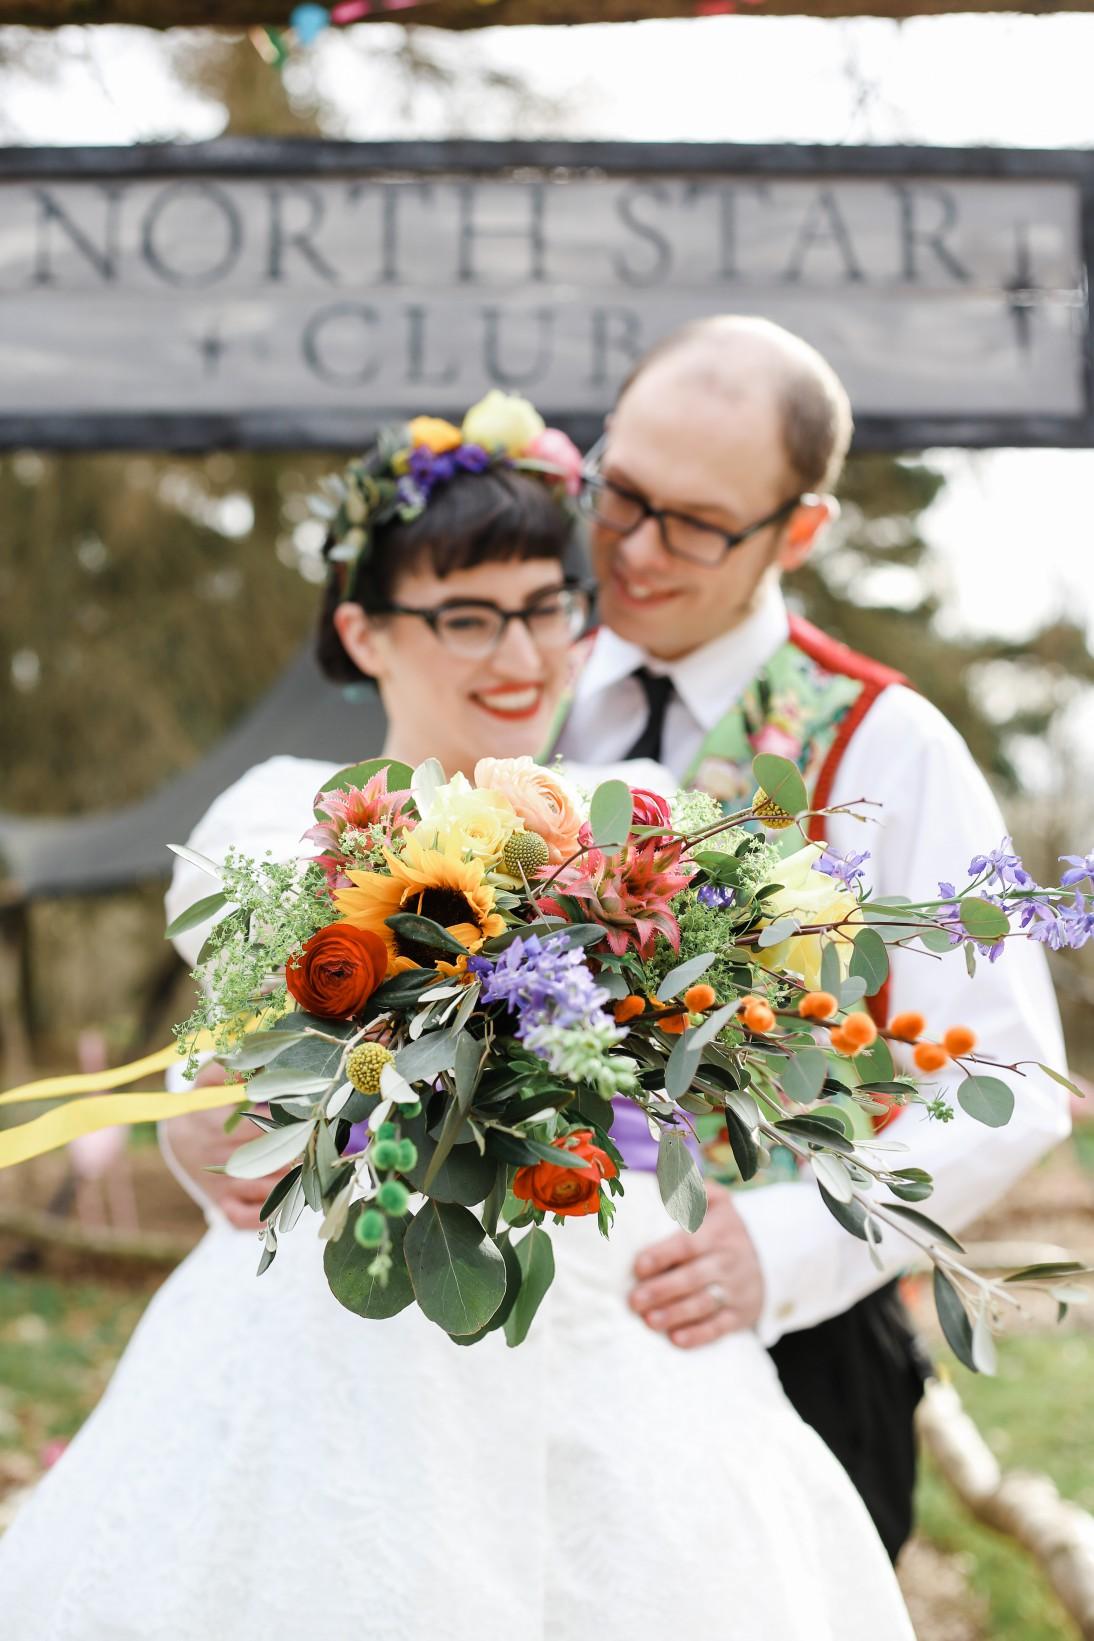 Becky Payne Photographer - Rainbow Unicorn Styled Wedding Shoot - Bright wedding flowers - colourful wedding flowers